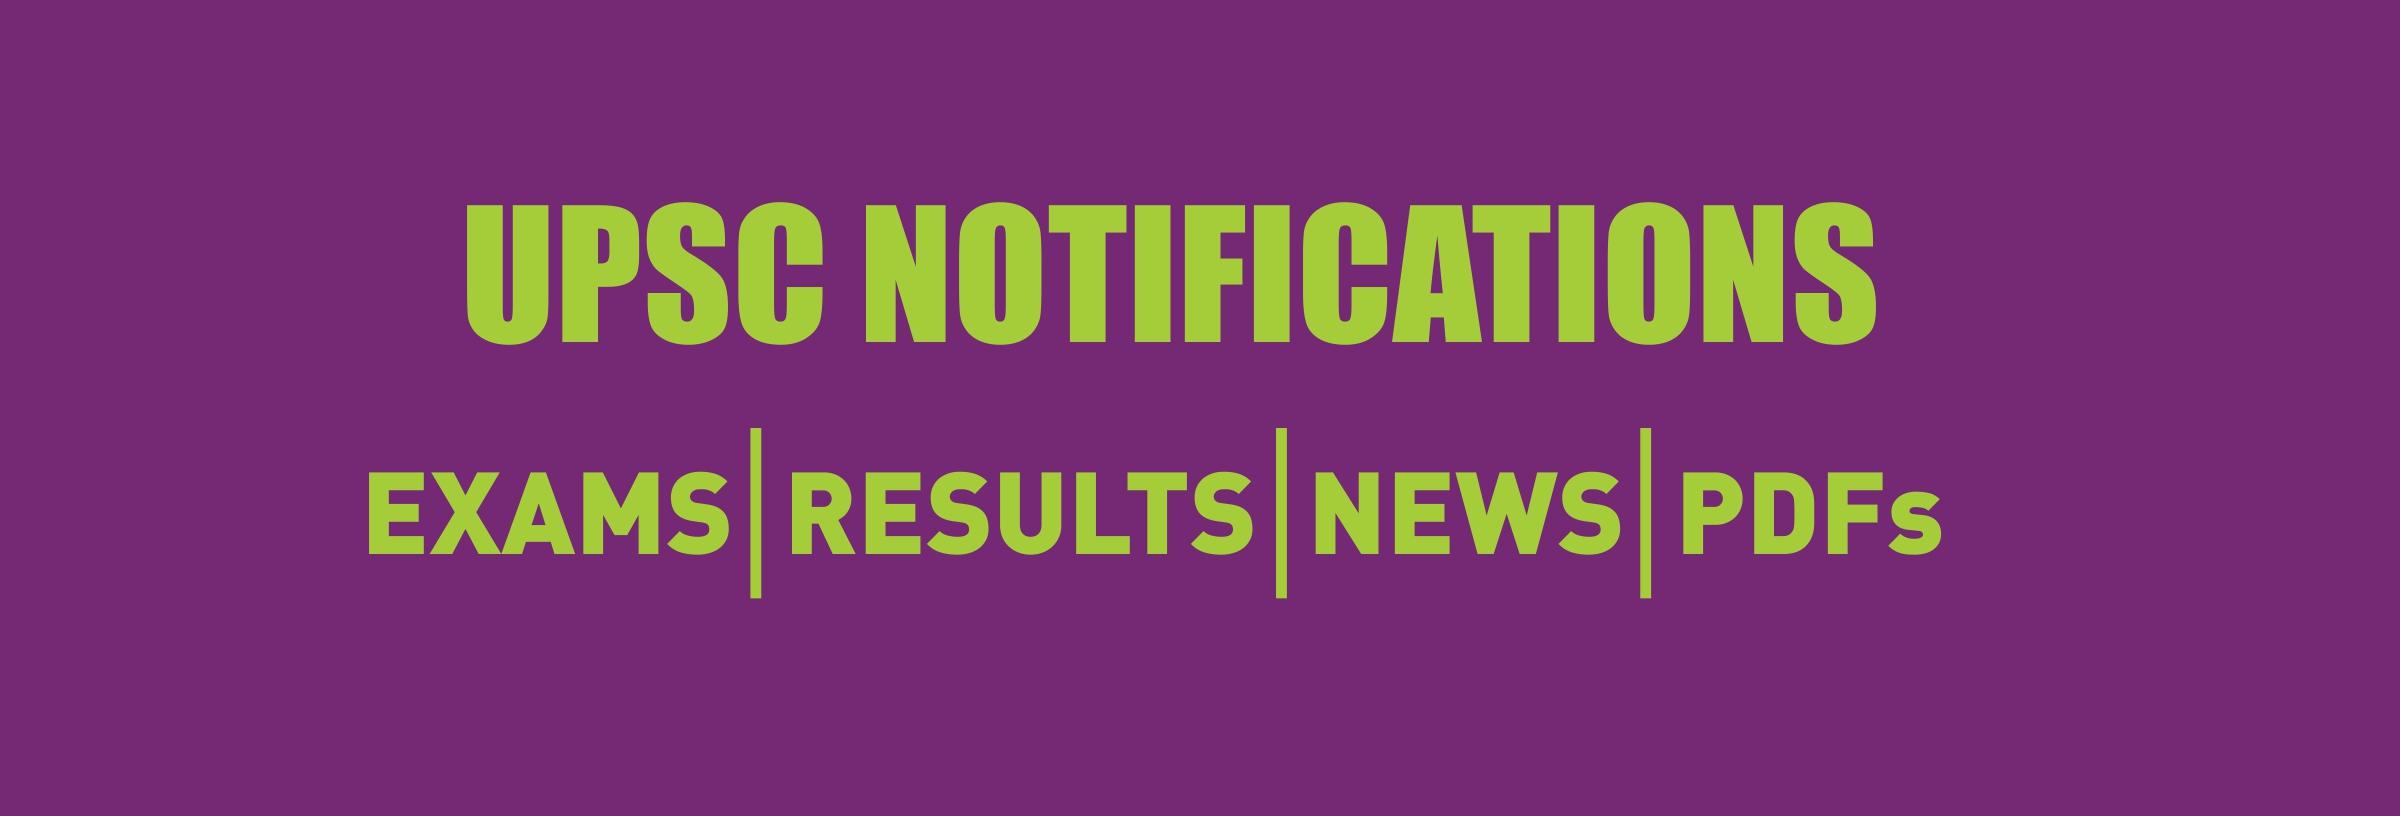 UPSC Notifications